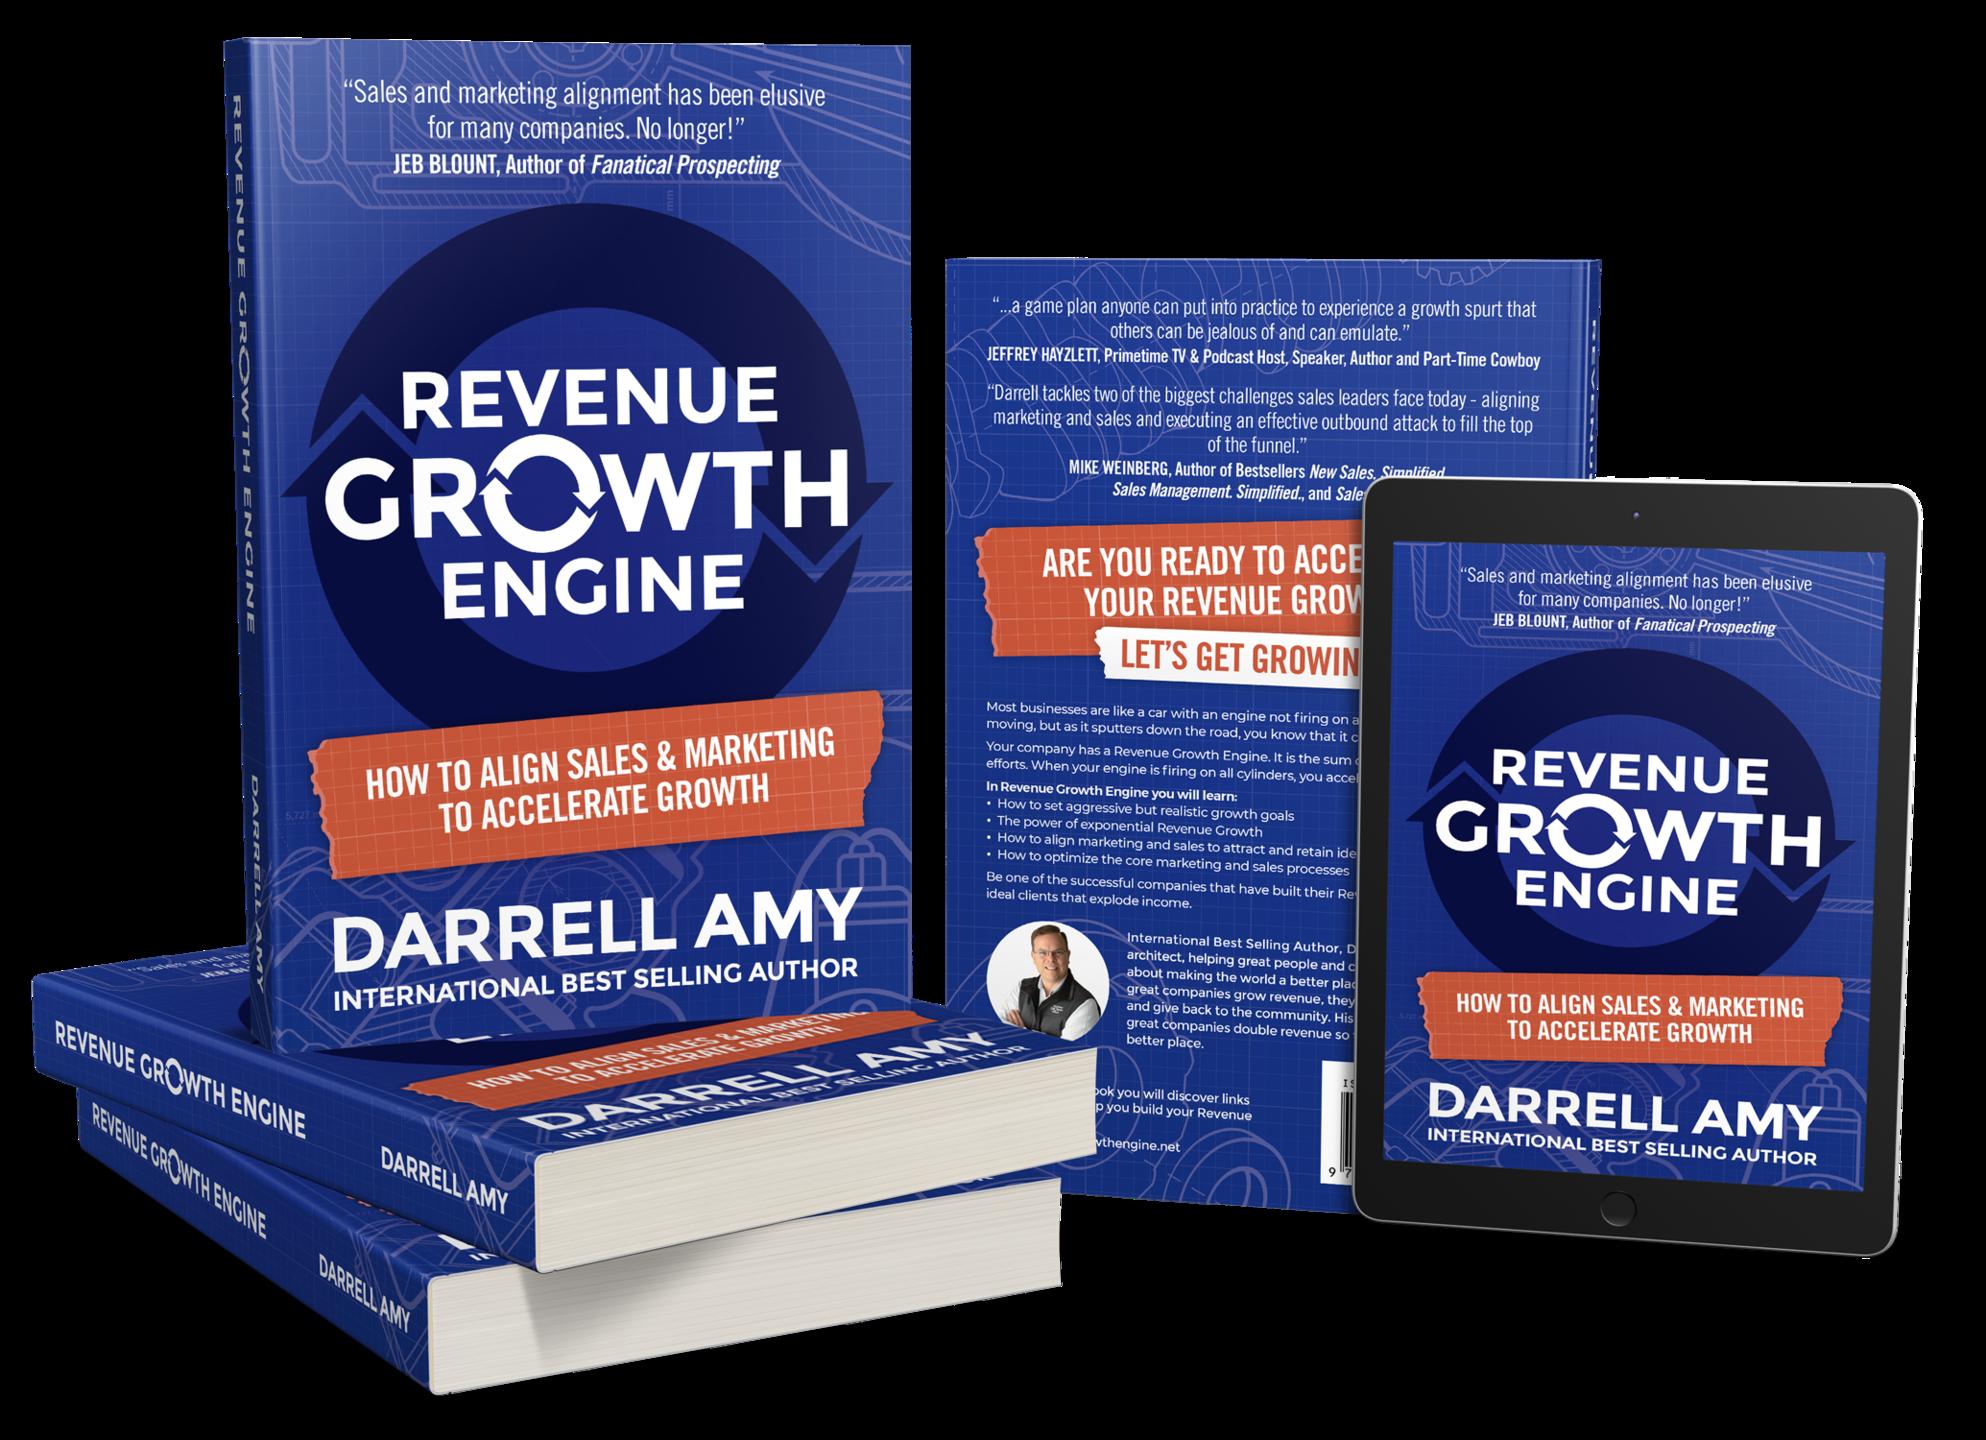 Revenue Growth Engine Books